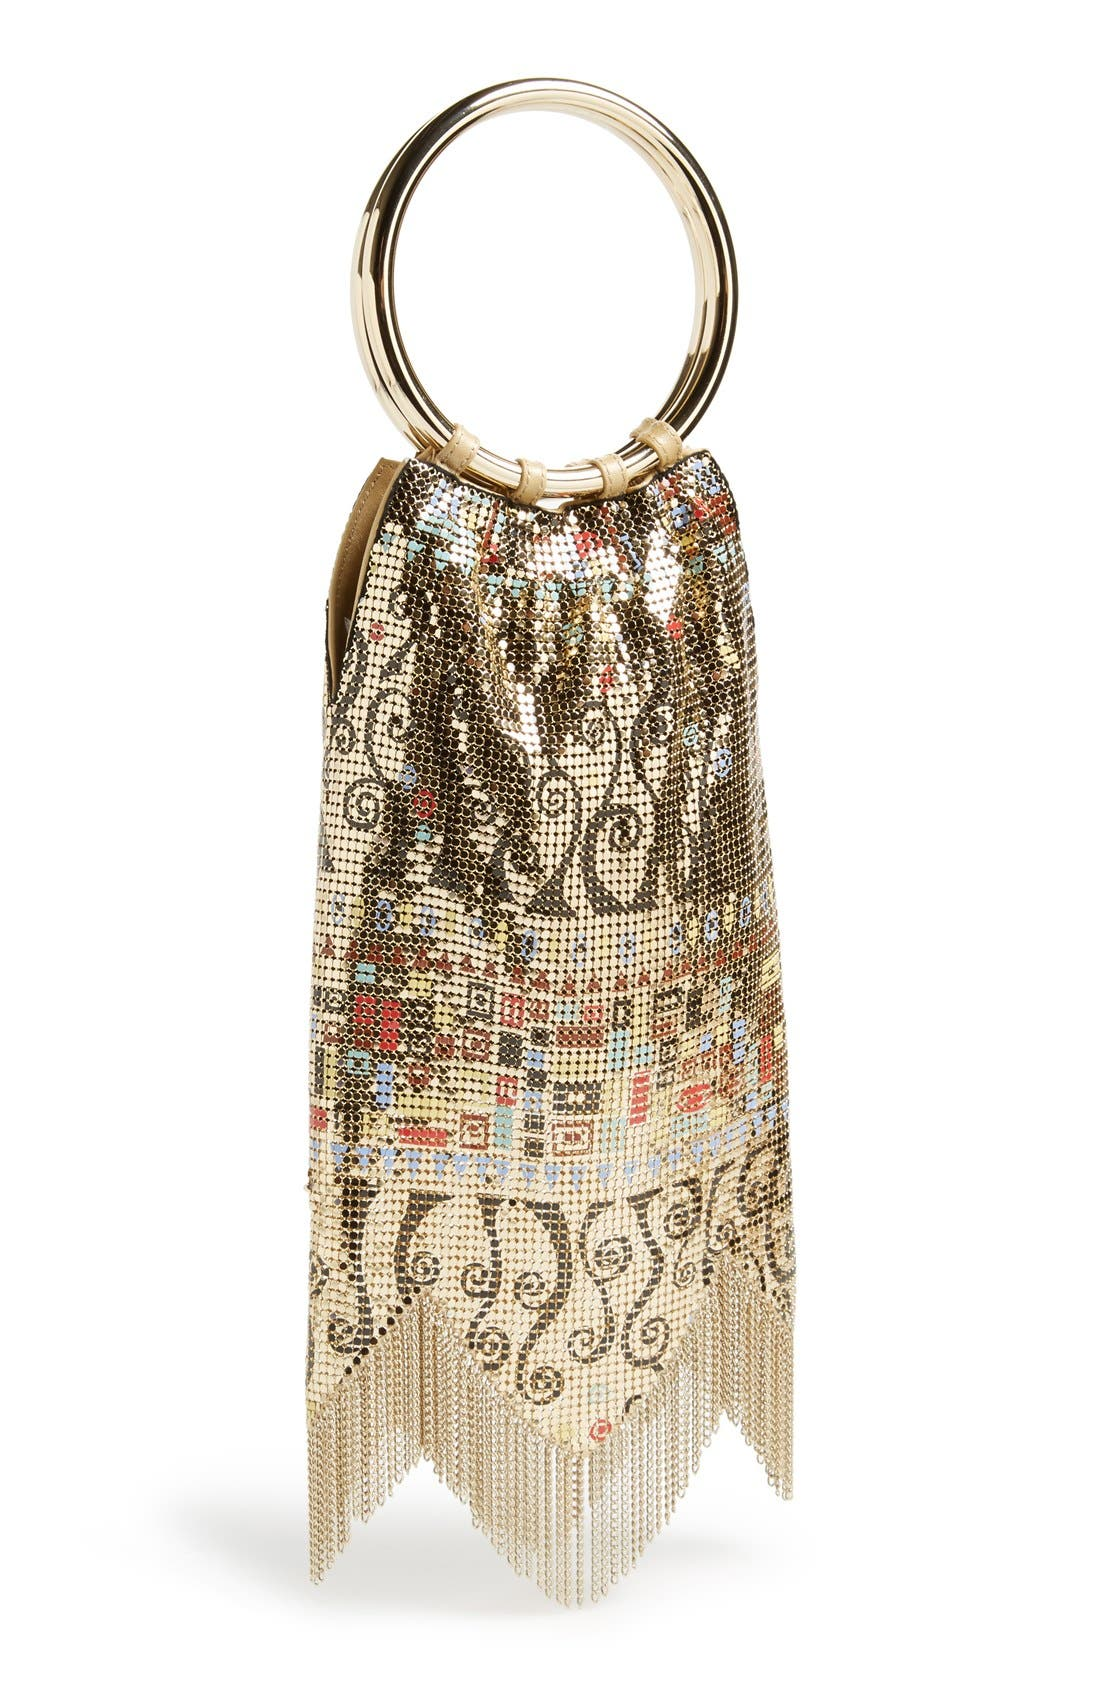 Alternate Image 1 Selected - Whiting & Davis 'Vienna' Metal Mesh Handbag